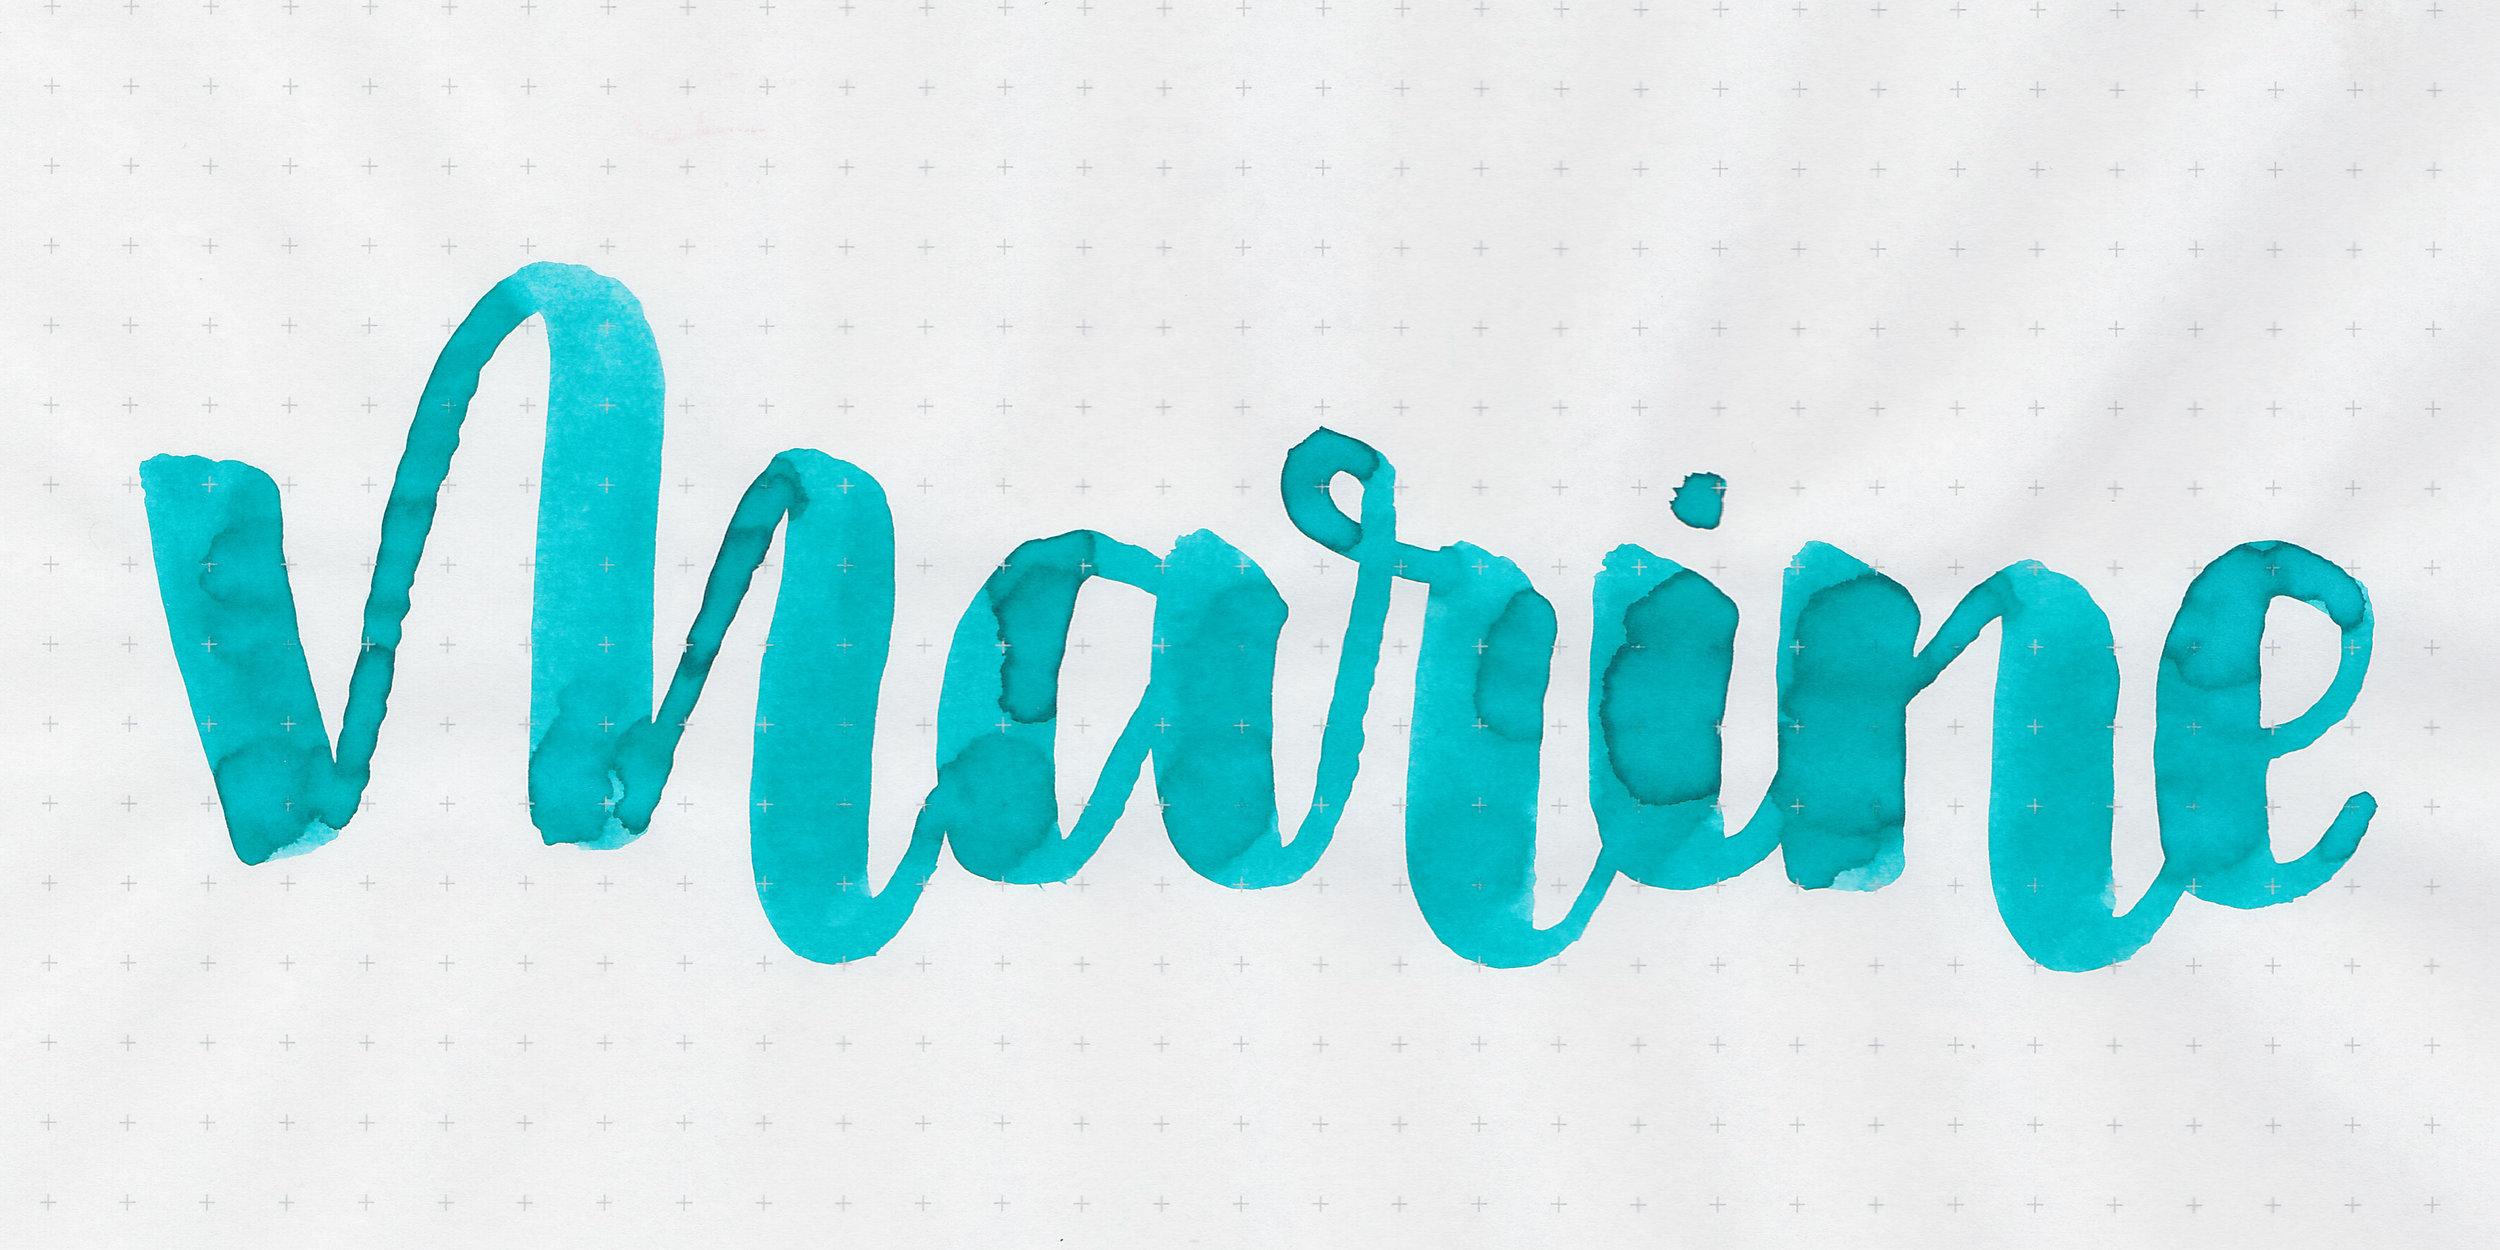 d-marine-2.jpg